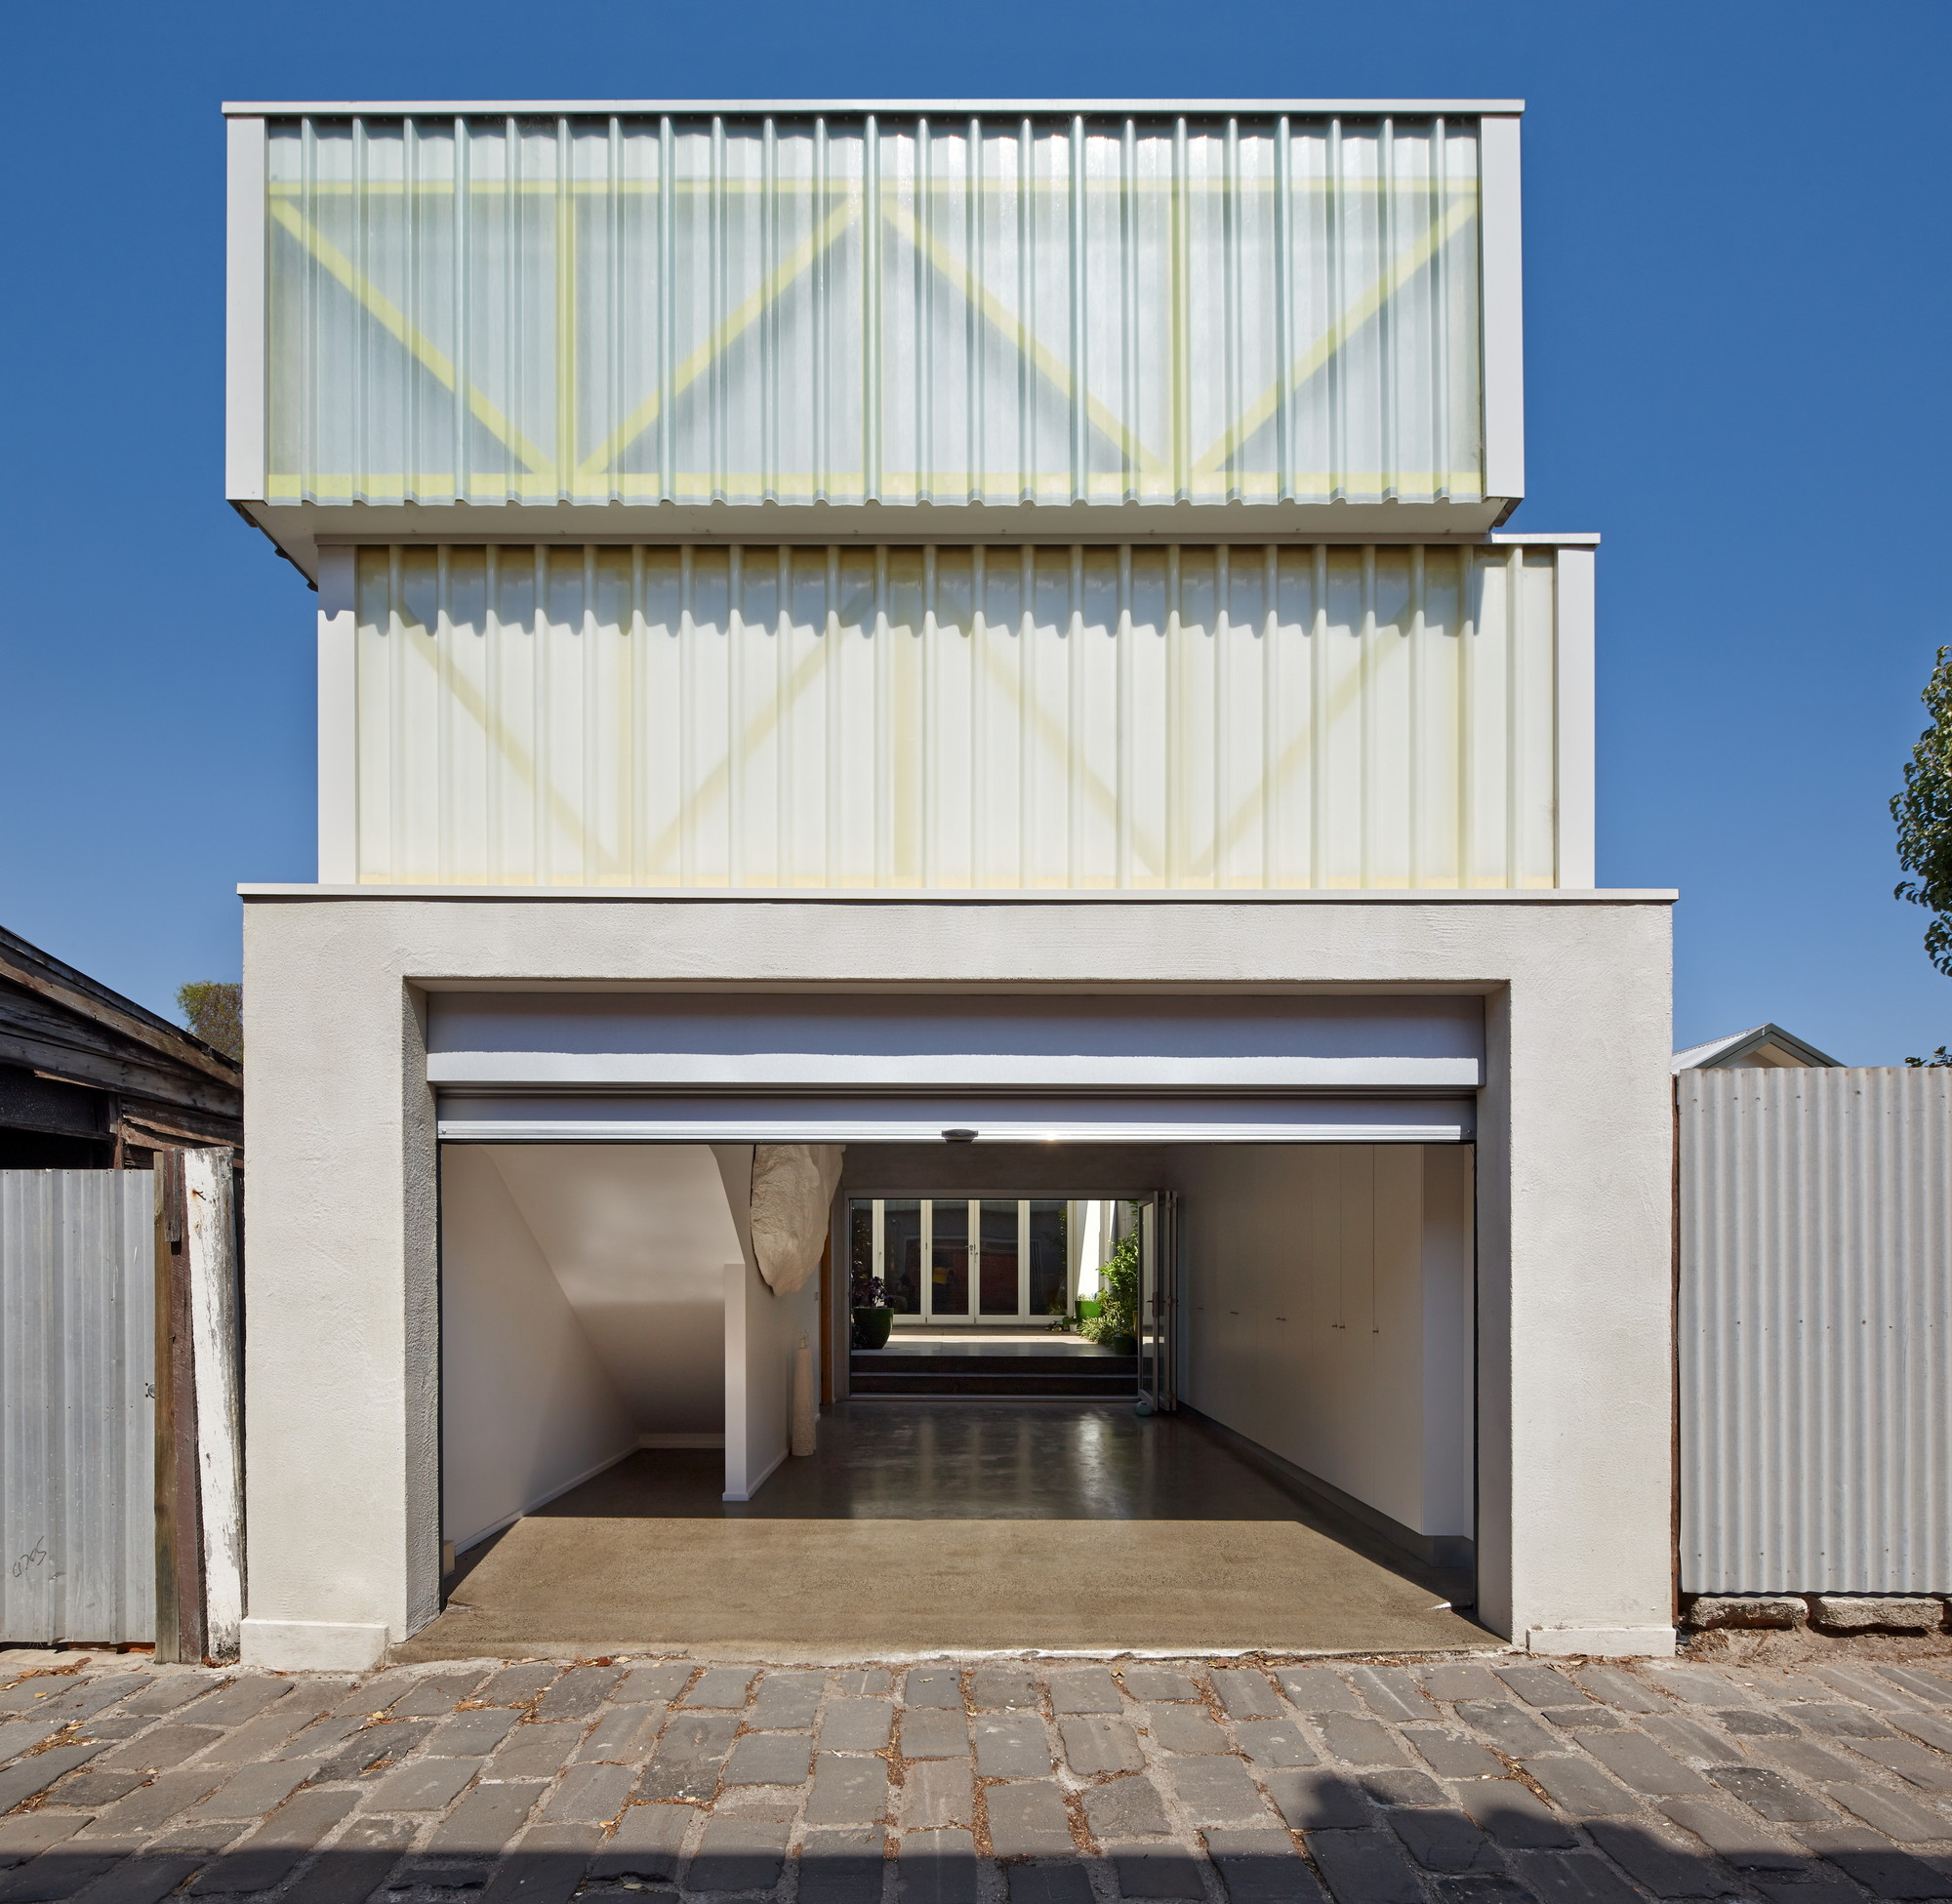 Middle Park Studio / Jean-Paul Rollo Architects, © Peter Bennetts